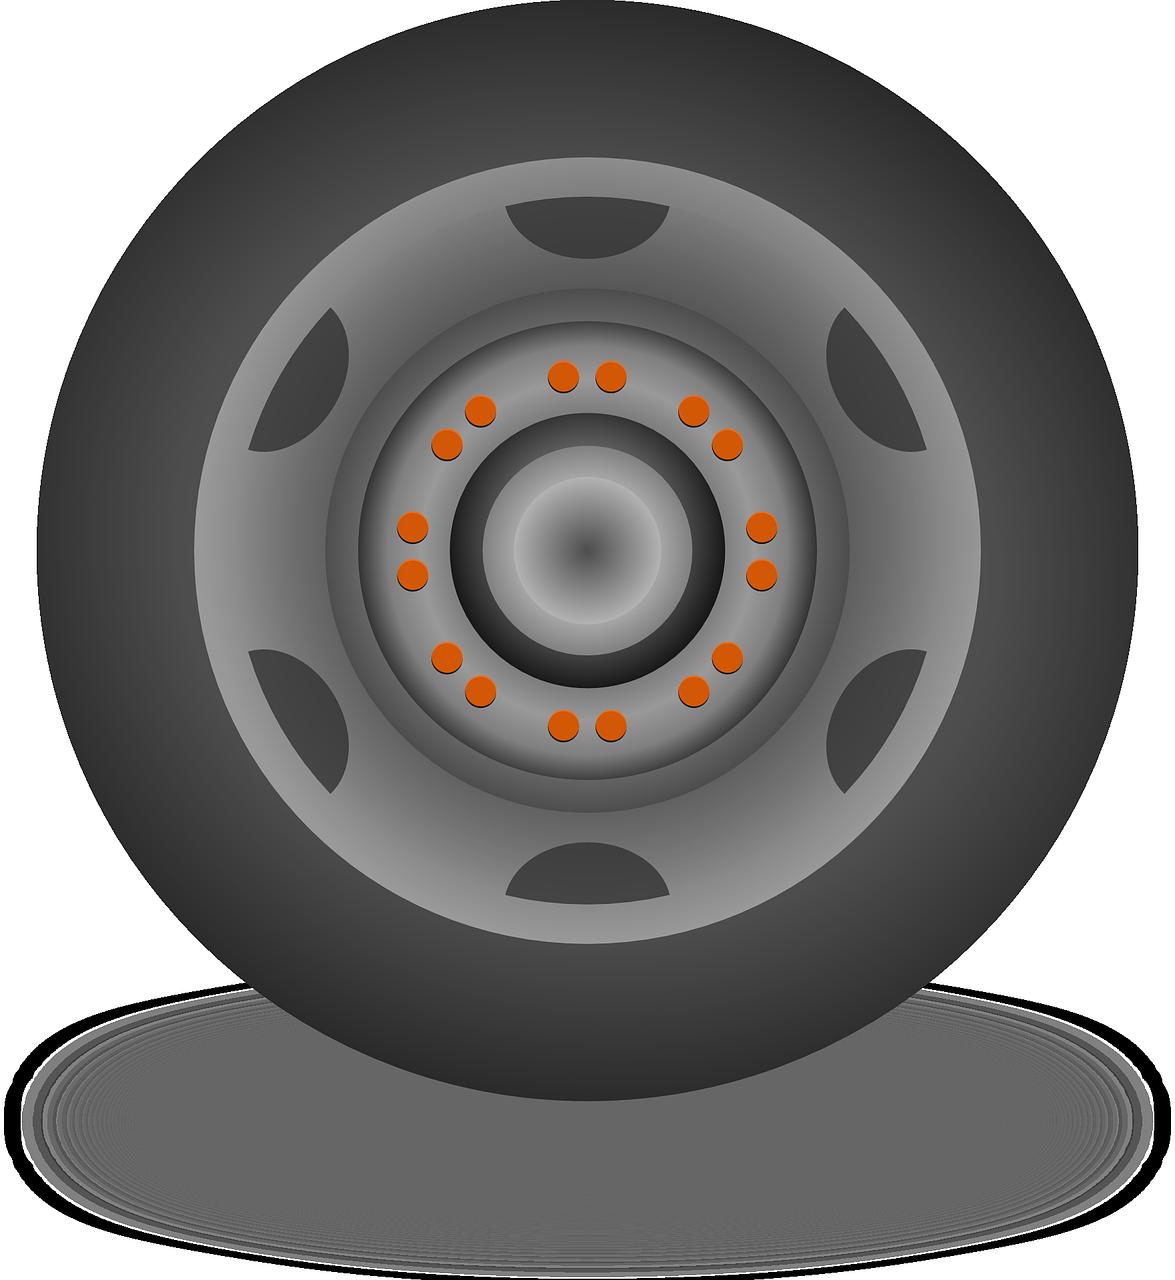 Ban Mobil Transportasi Gambar Vektor Gratis Di Pixabay